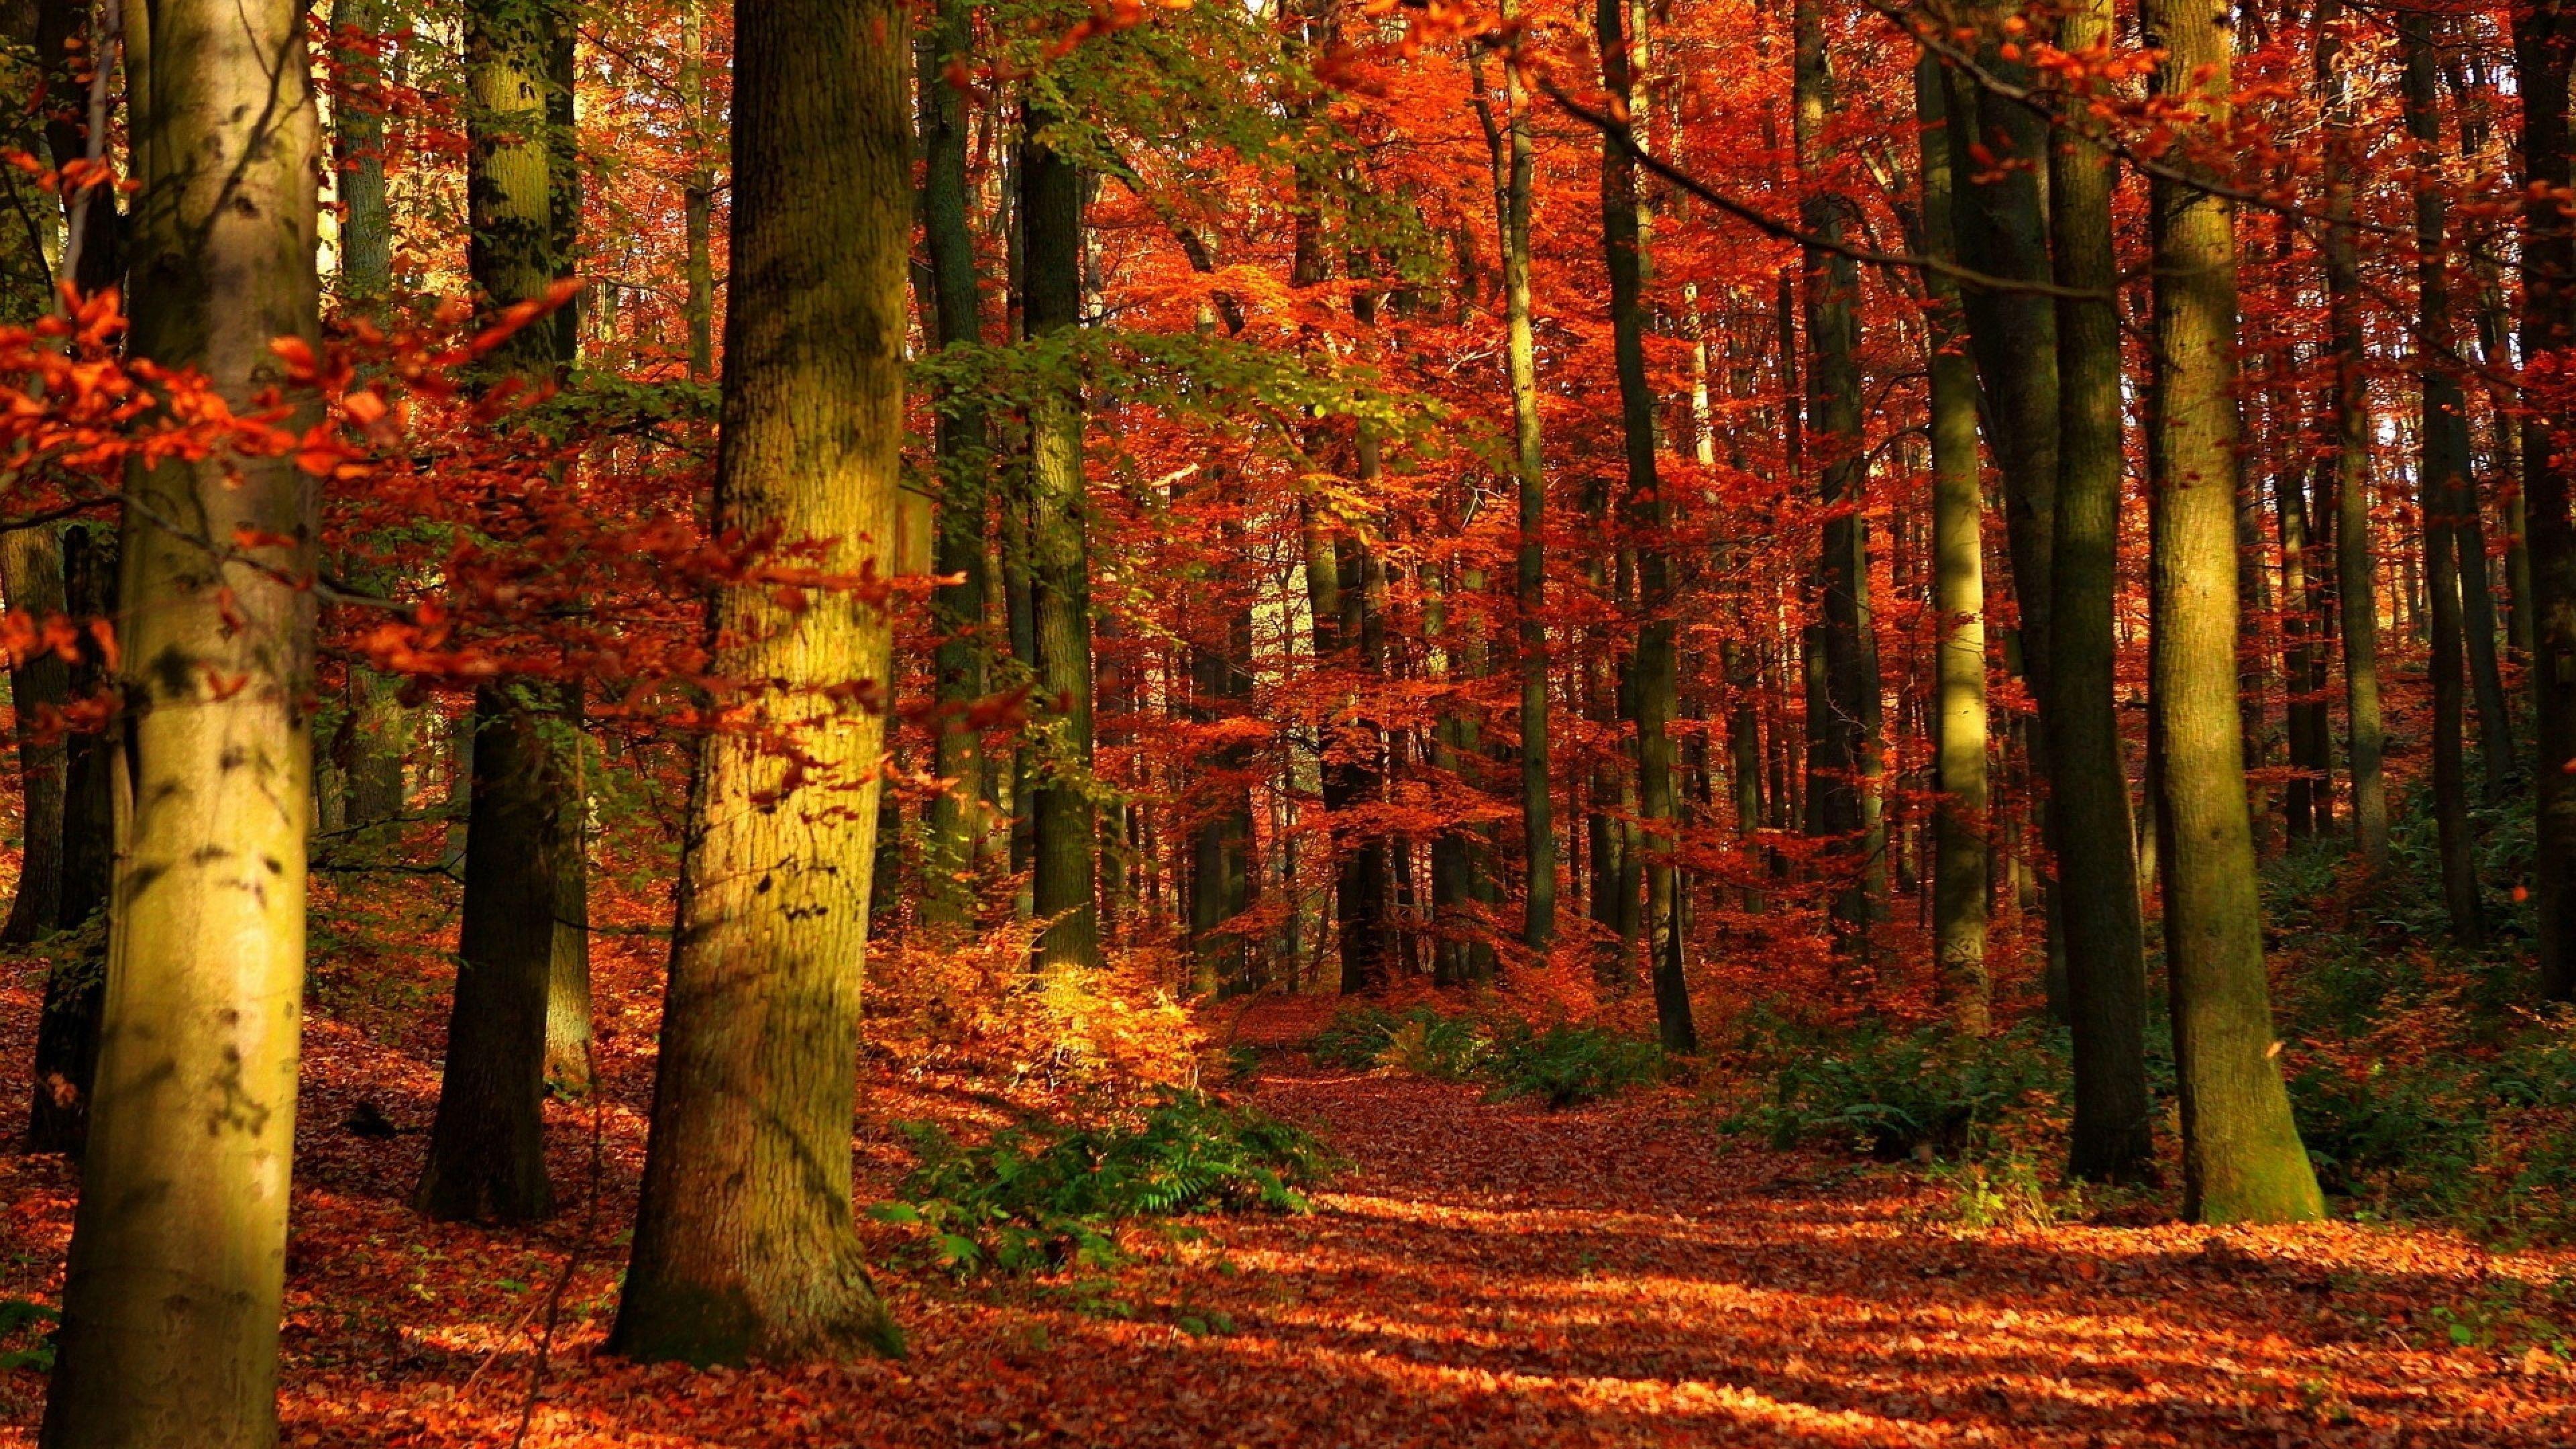 Ultra Hd Autumn Wallpapers Top Free Ultra Hd Autumn